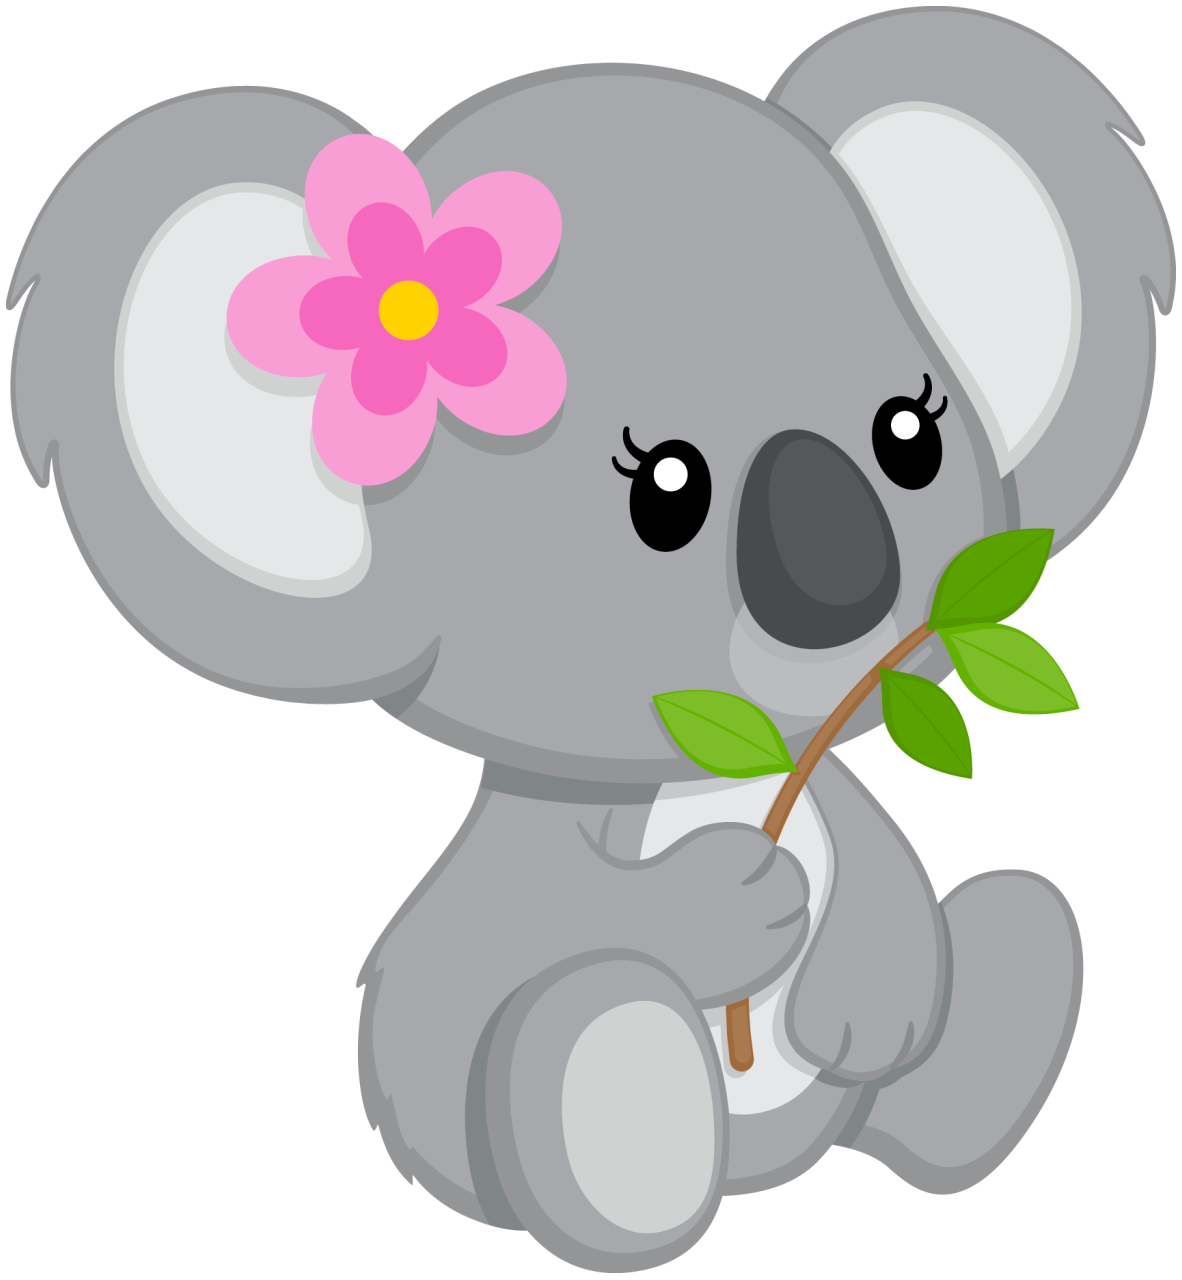 Koala bear Coala desenho, Bebê coala, Desenhos de bichinhos